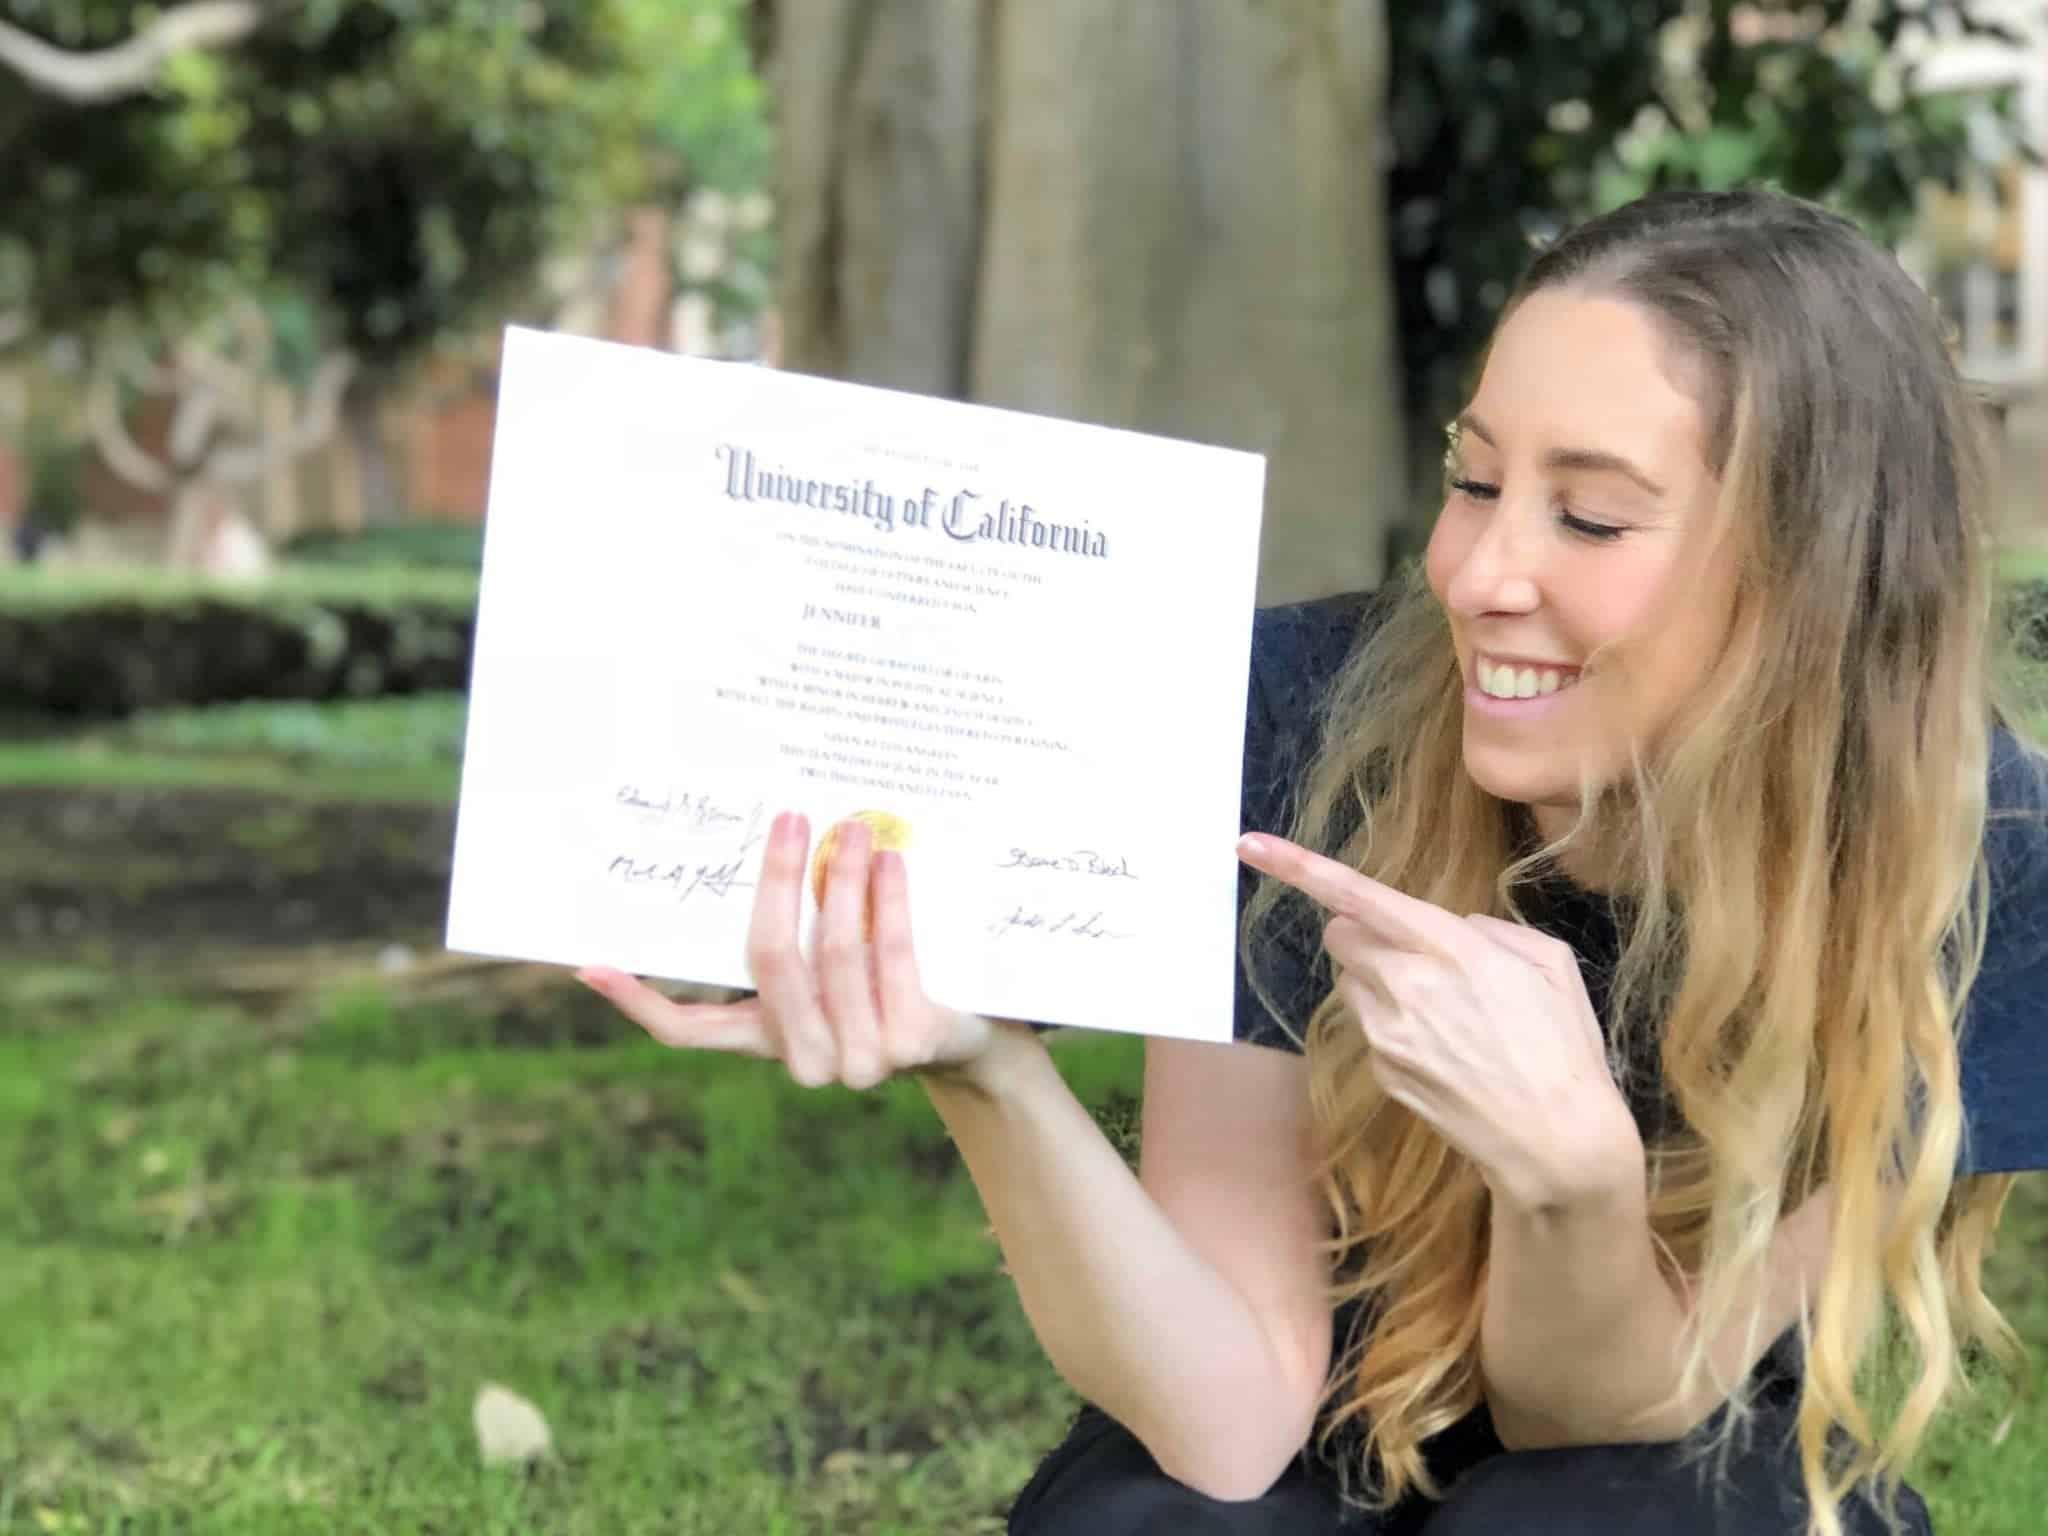 UCLA college diploma